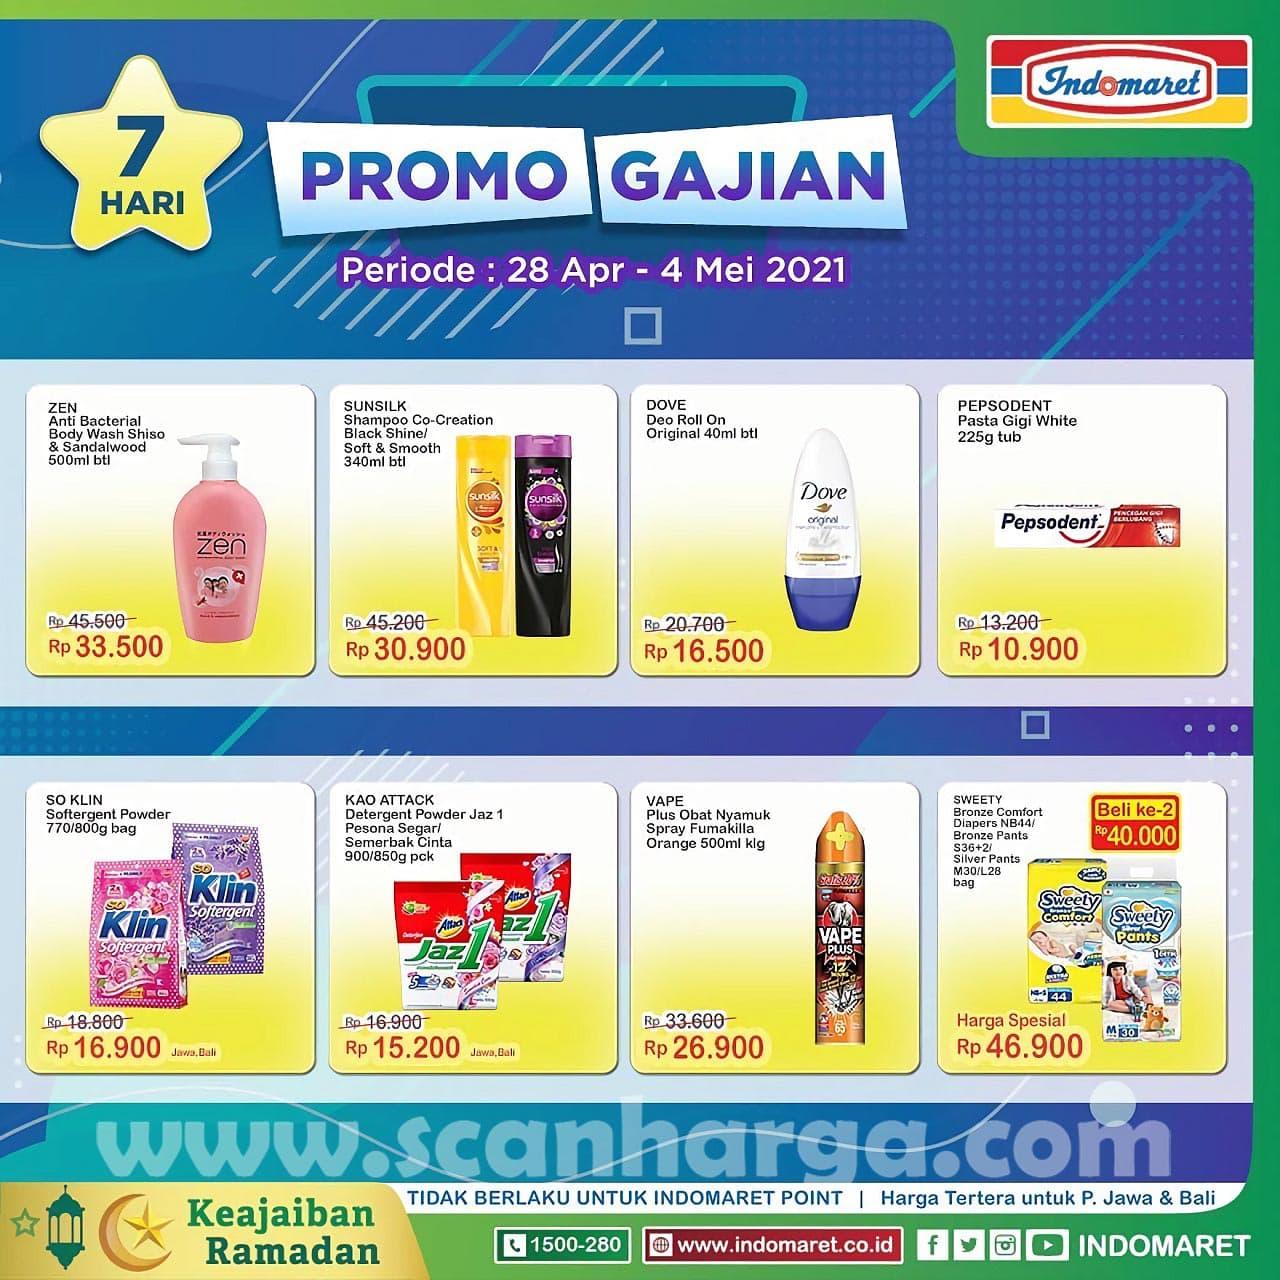 INDOMARET Promo GAJIAN Periode 28 April - 4 Mei 2021 2